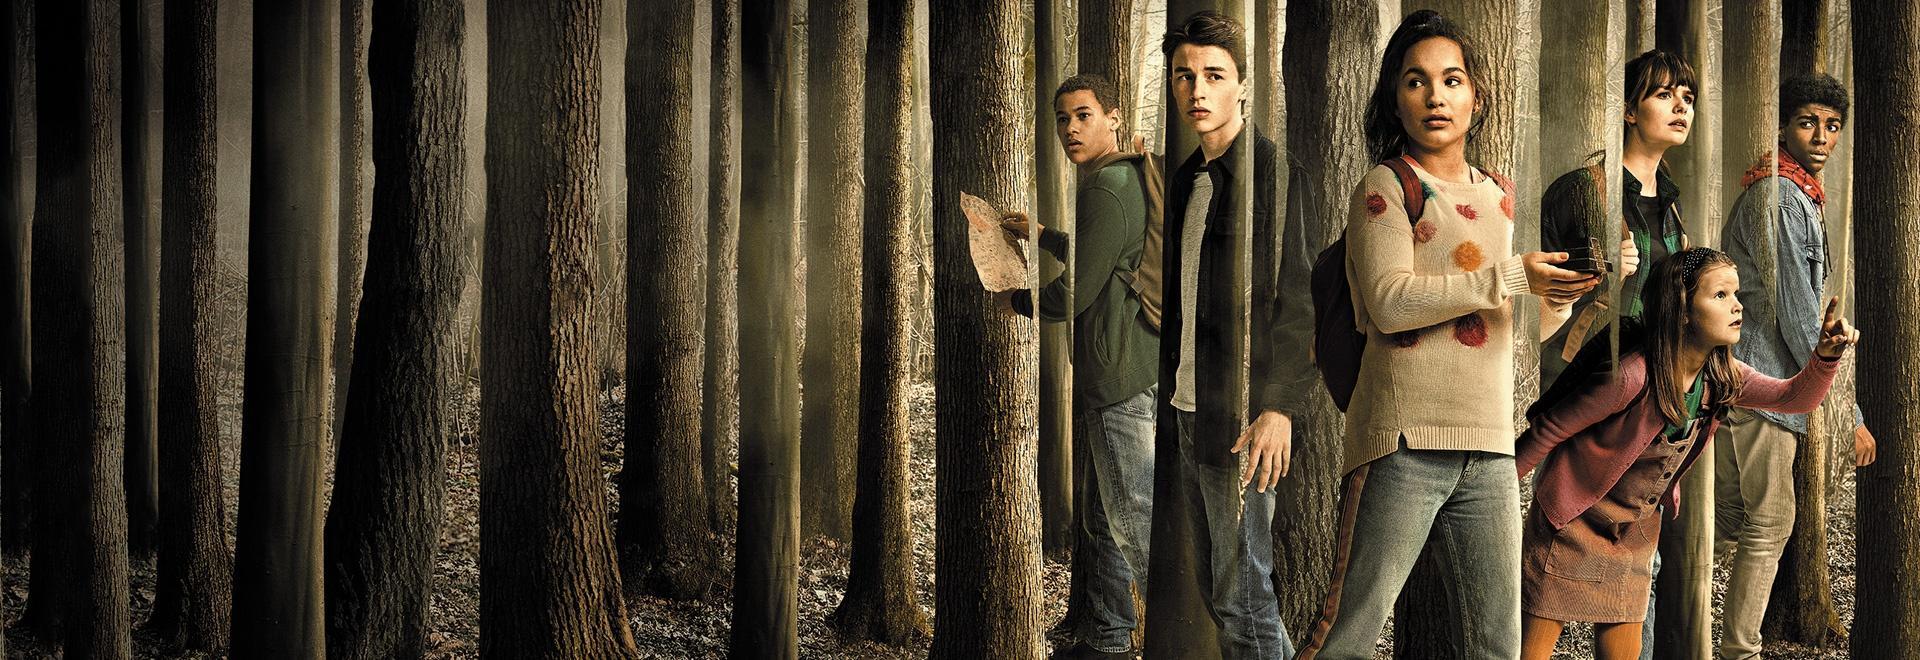 Sperduti nel bosco